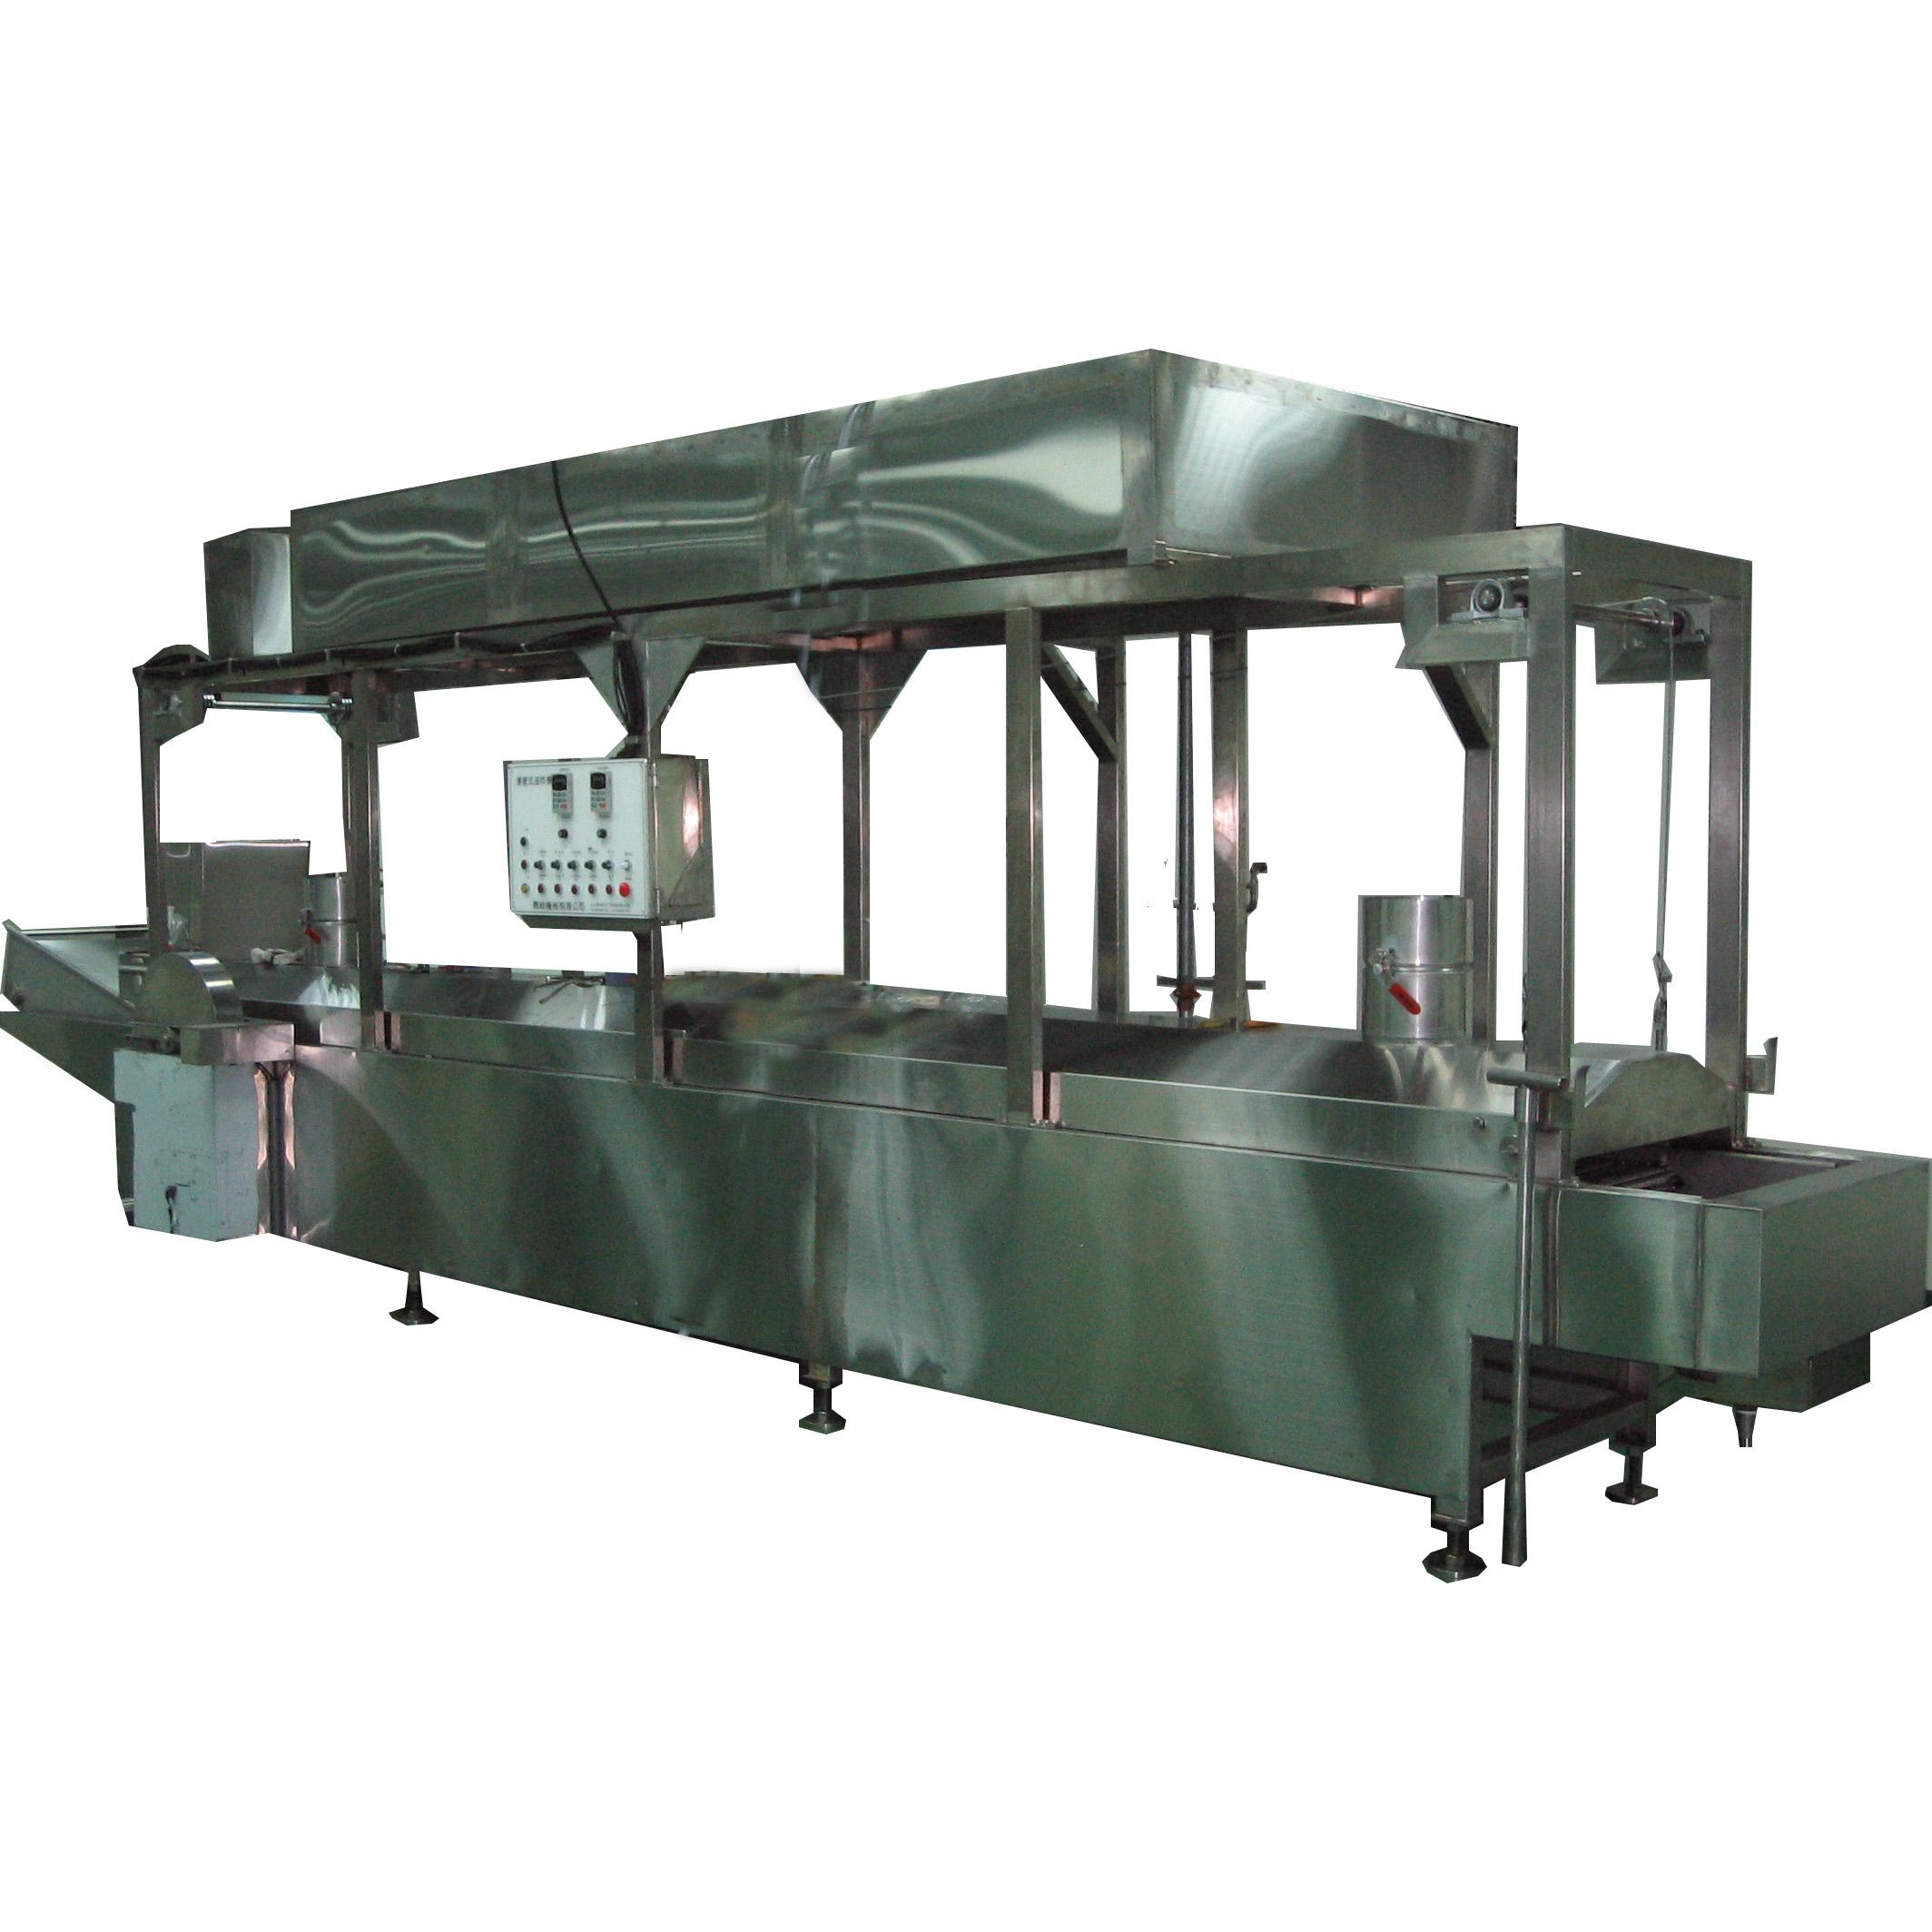 Submerged-Type Frying Machine